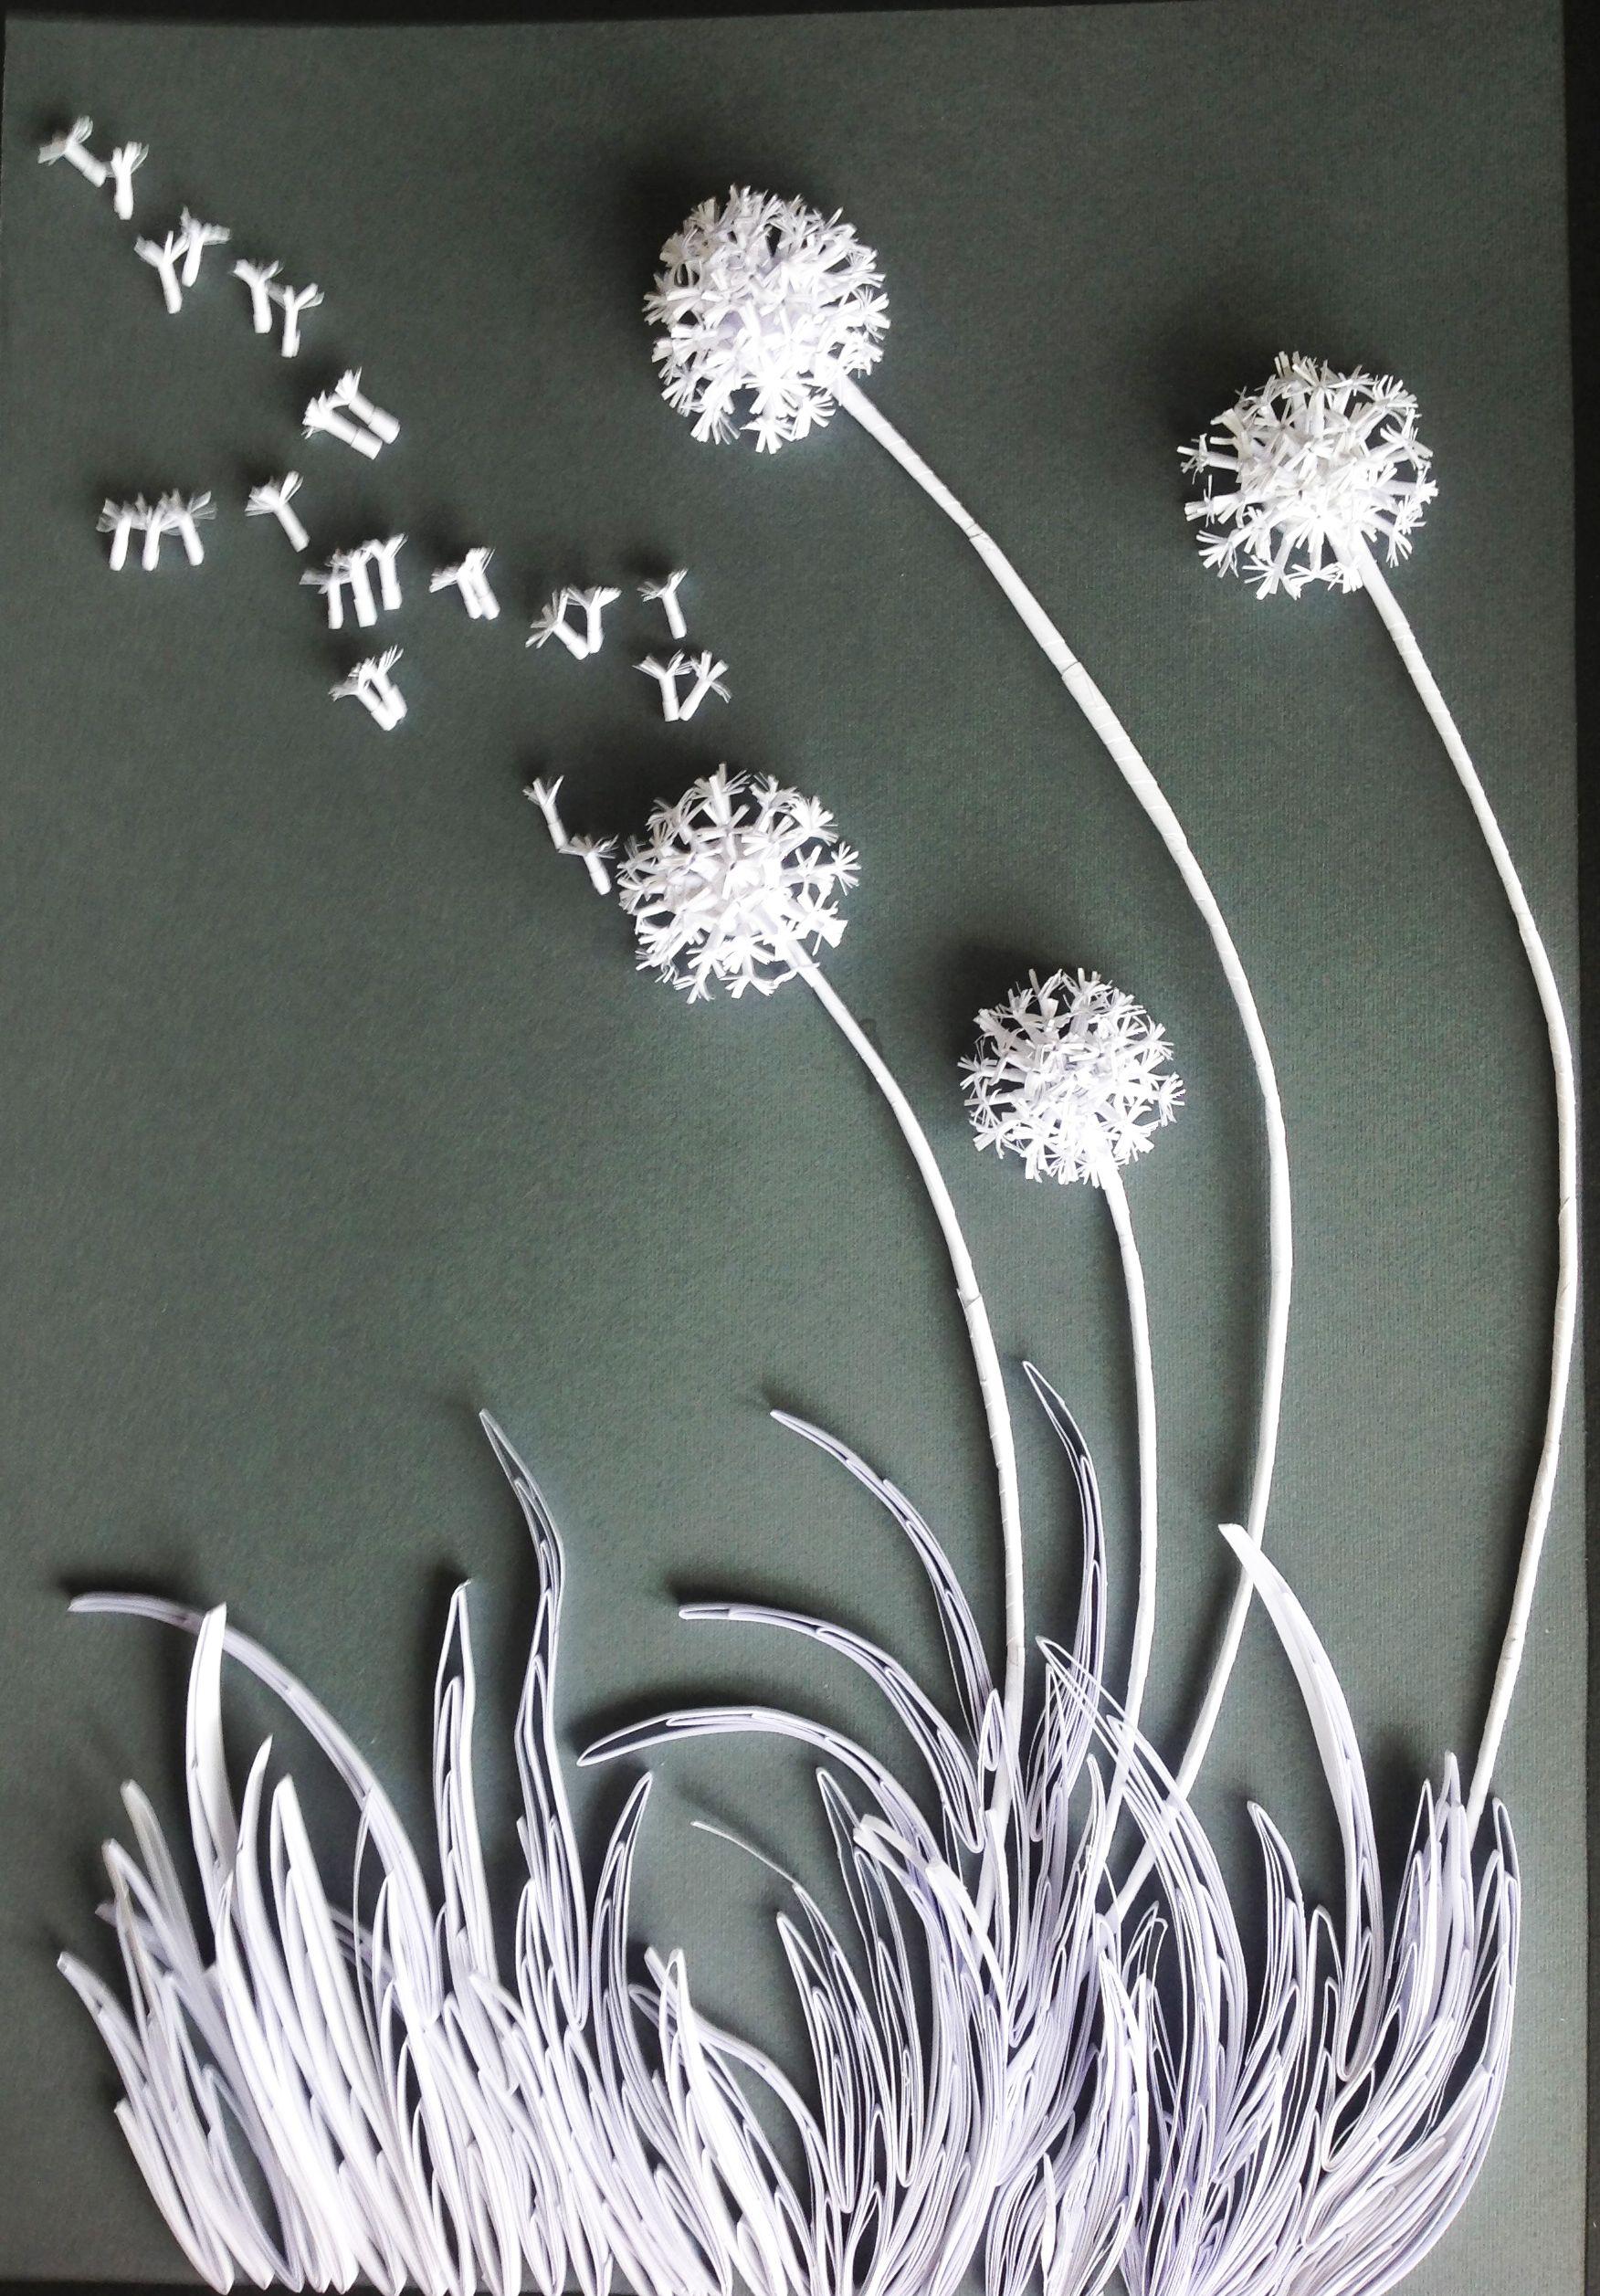 White Paper Dandelion, 37 X 52 Cm By Yesterdays News